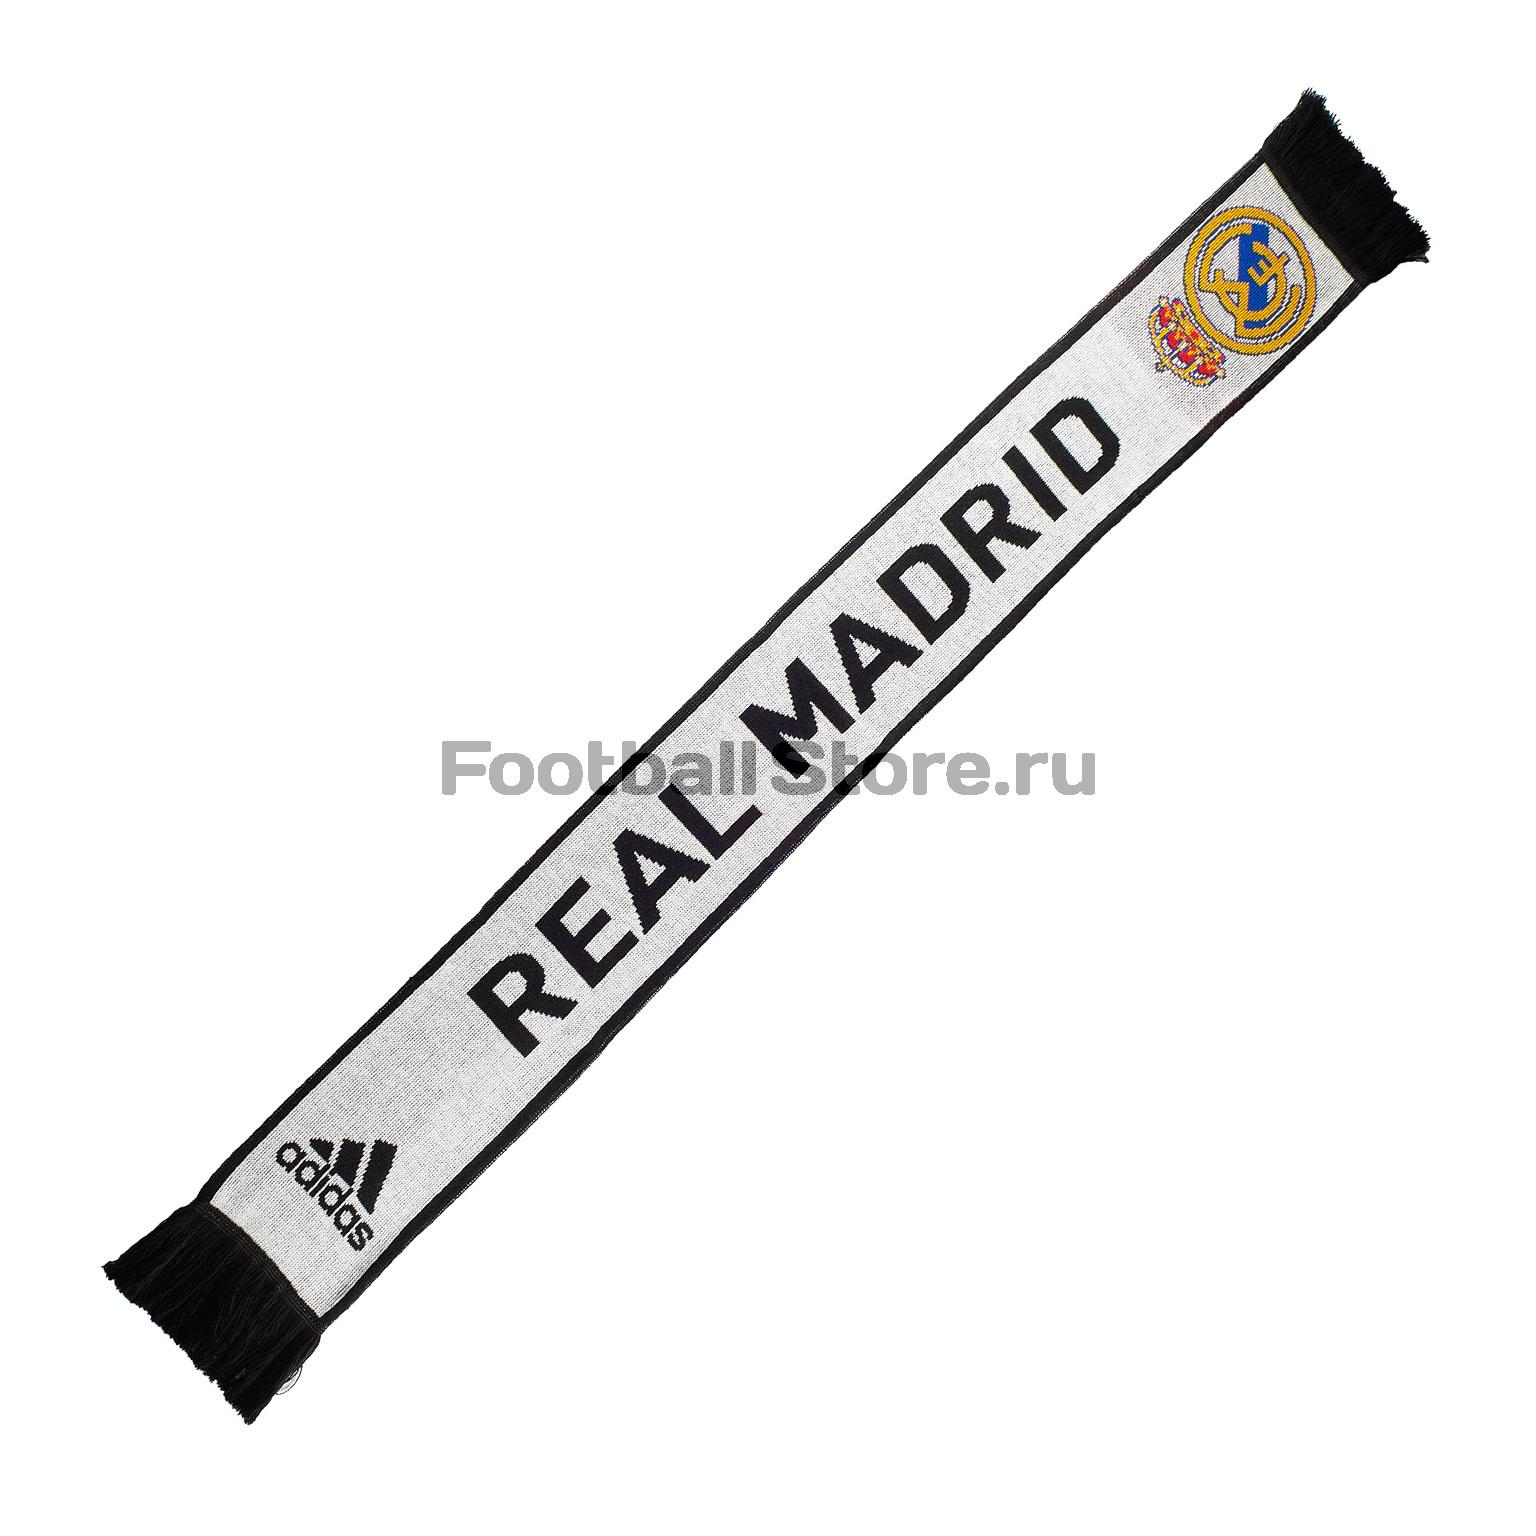 Шарф болельщика Adidas Real Madrid CY5602 рюкзак adidas real madrid id br7132